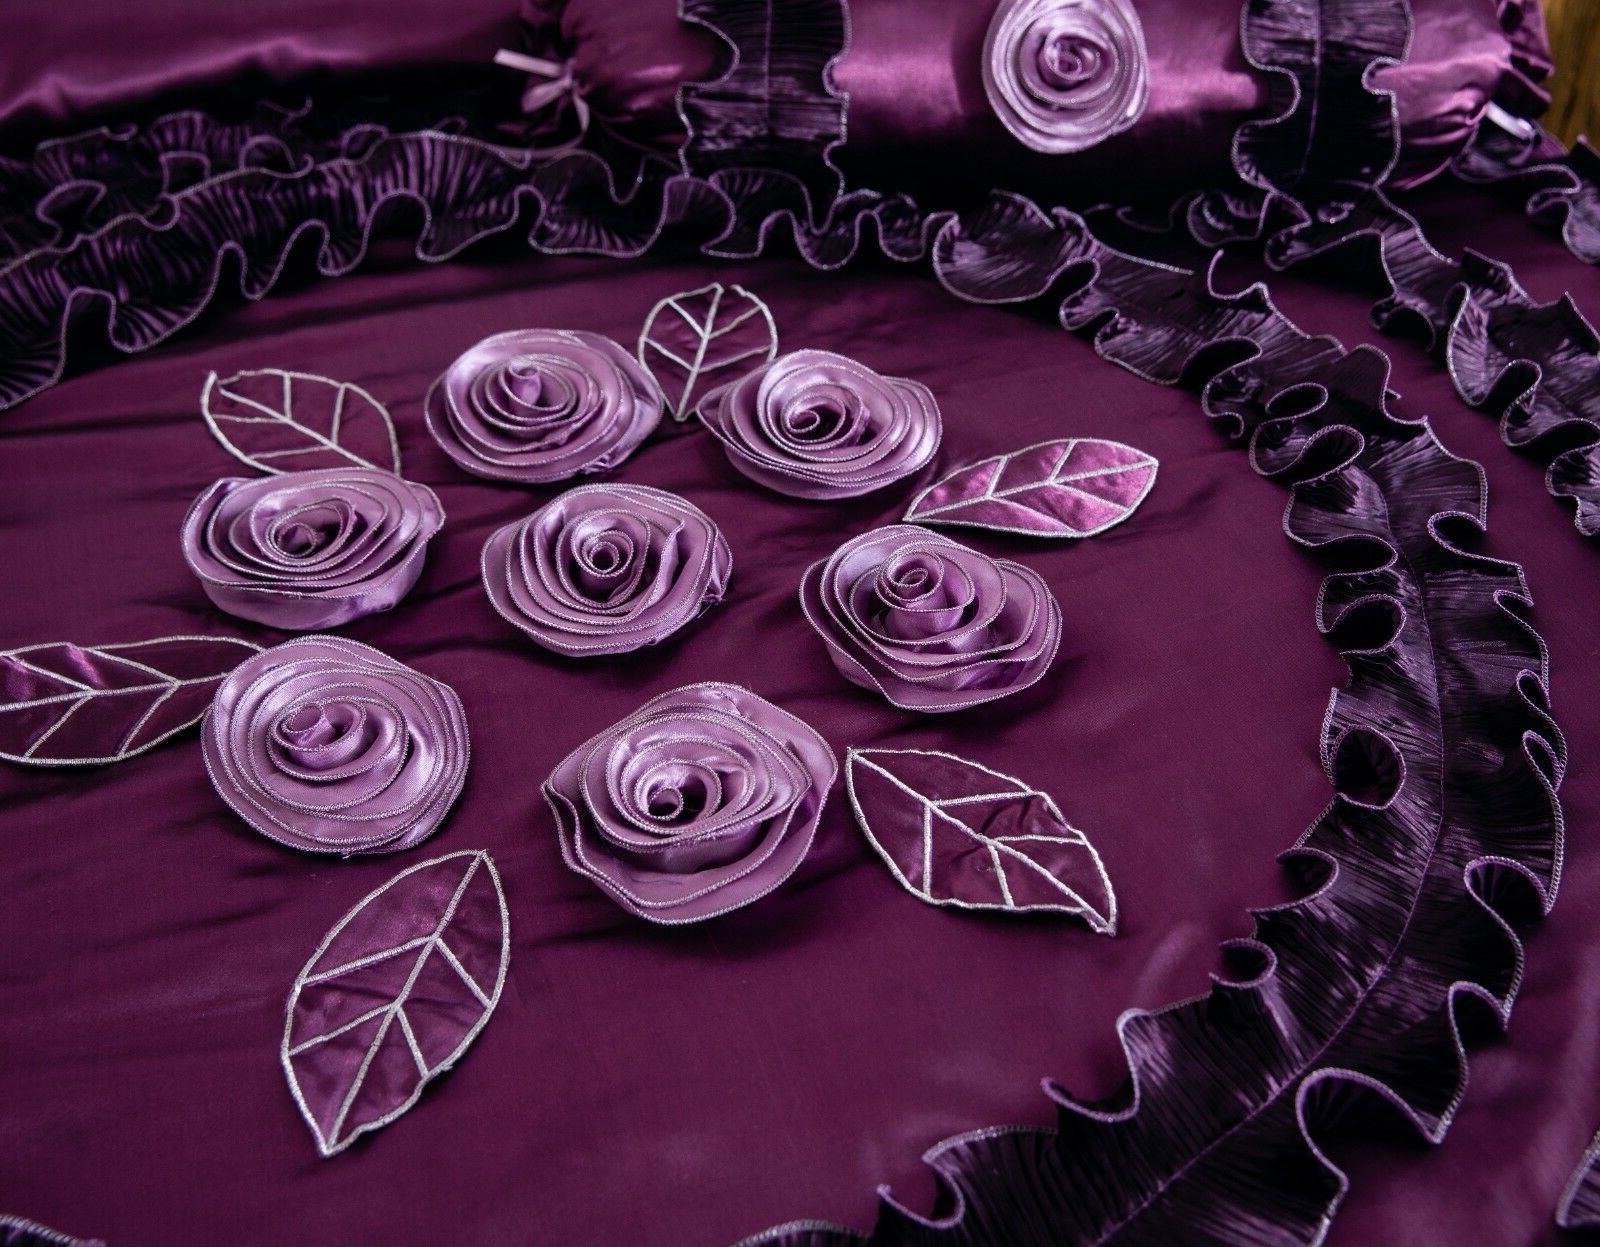 Tache Fancy Ruffles Purple Midnight Bedding